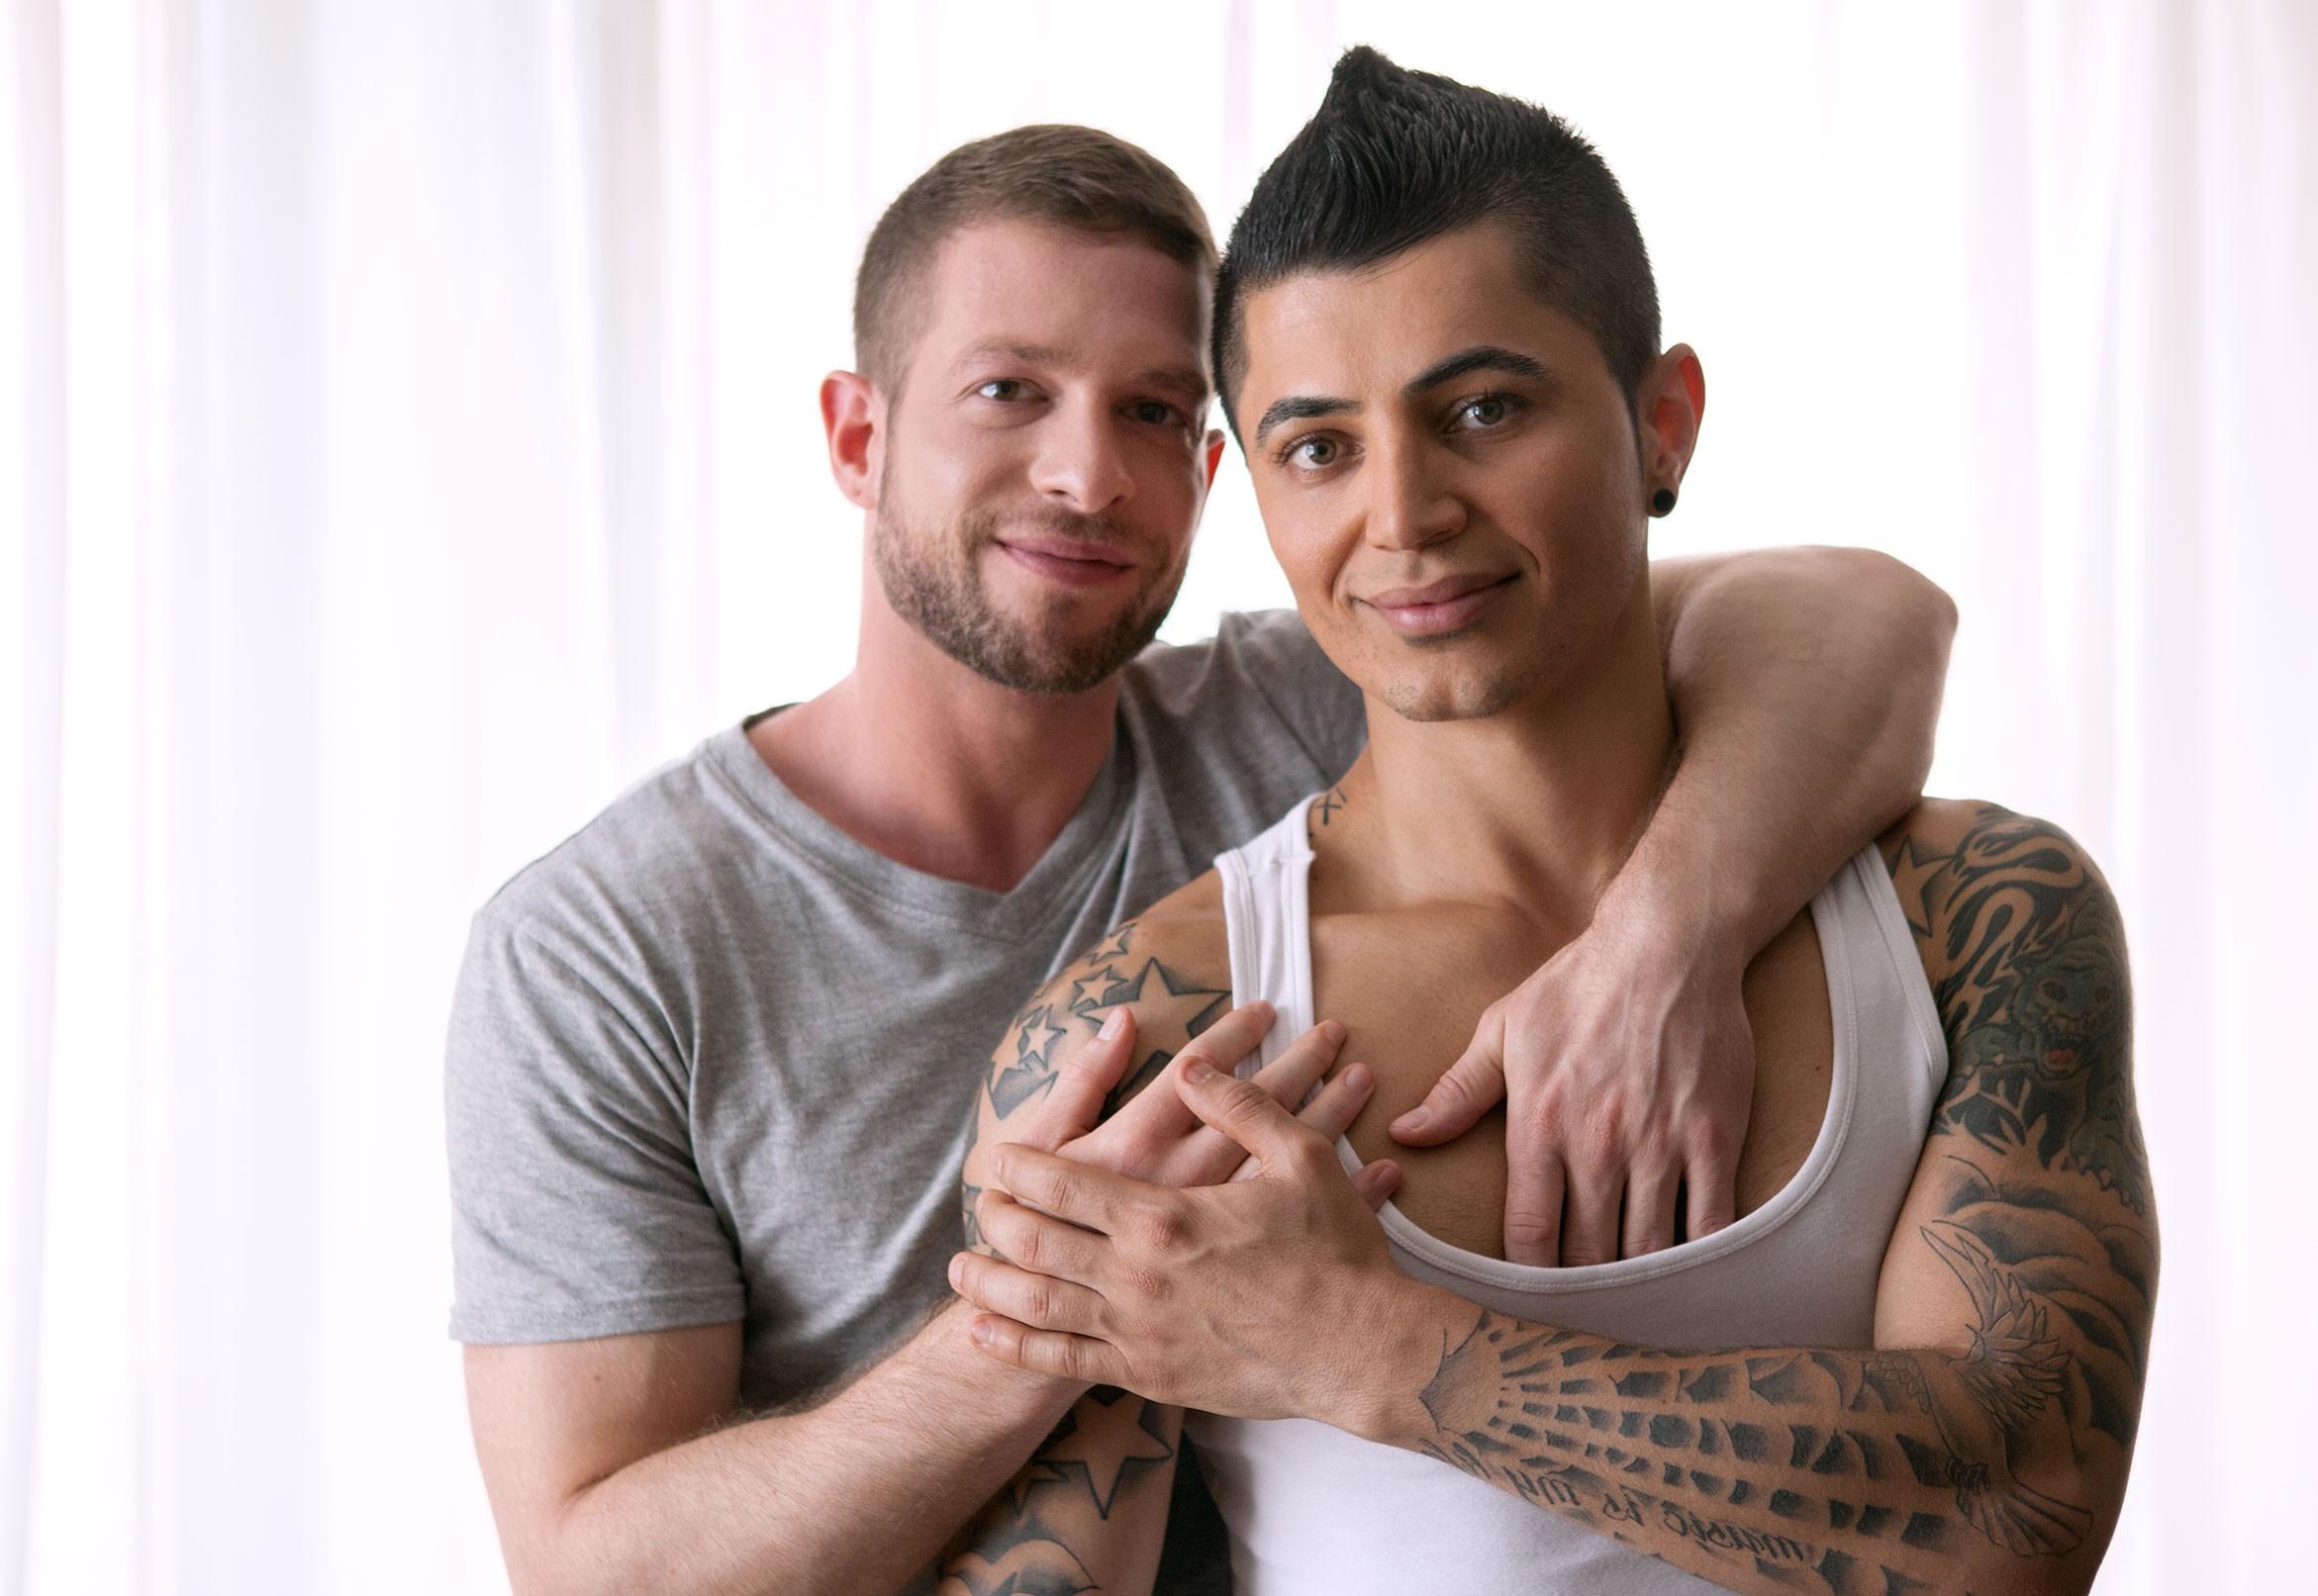 Matthew Parker and San Baptiste